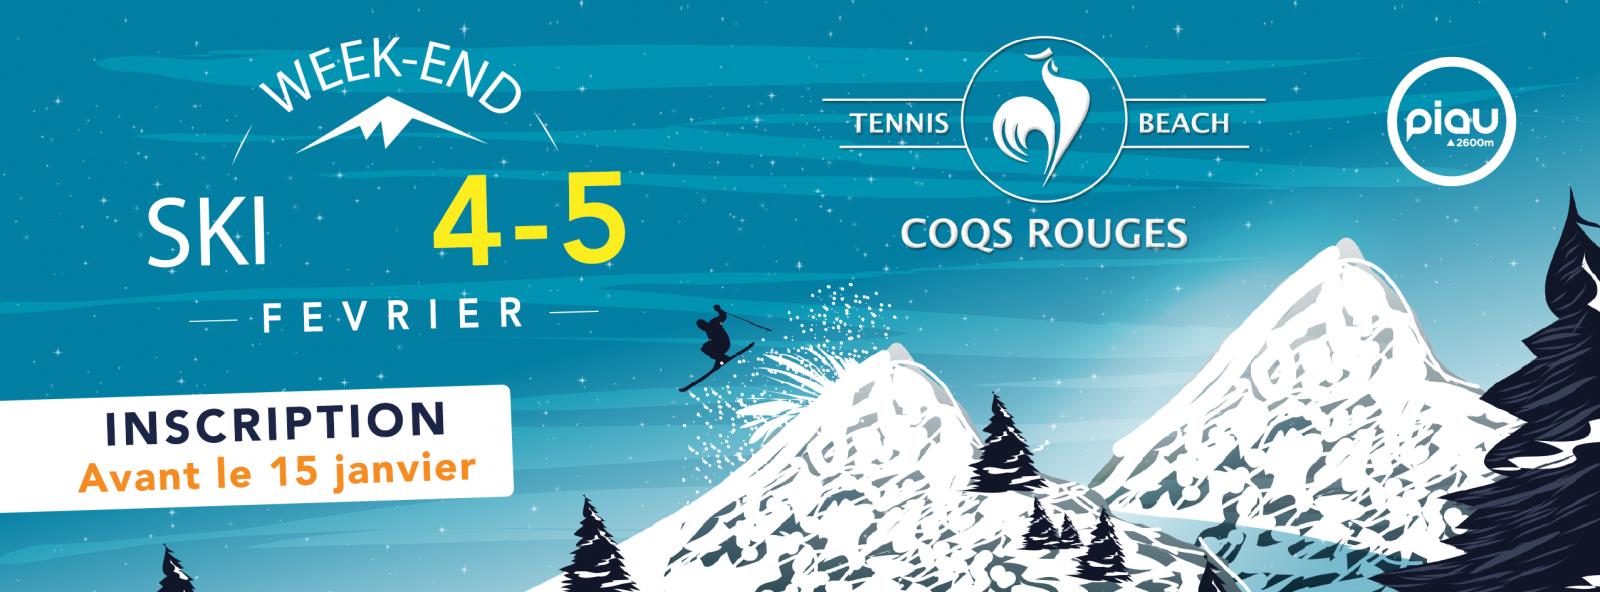 Sortie Ski 2017 bandeau